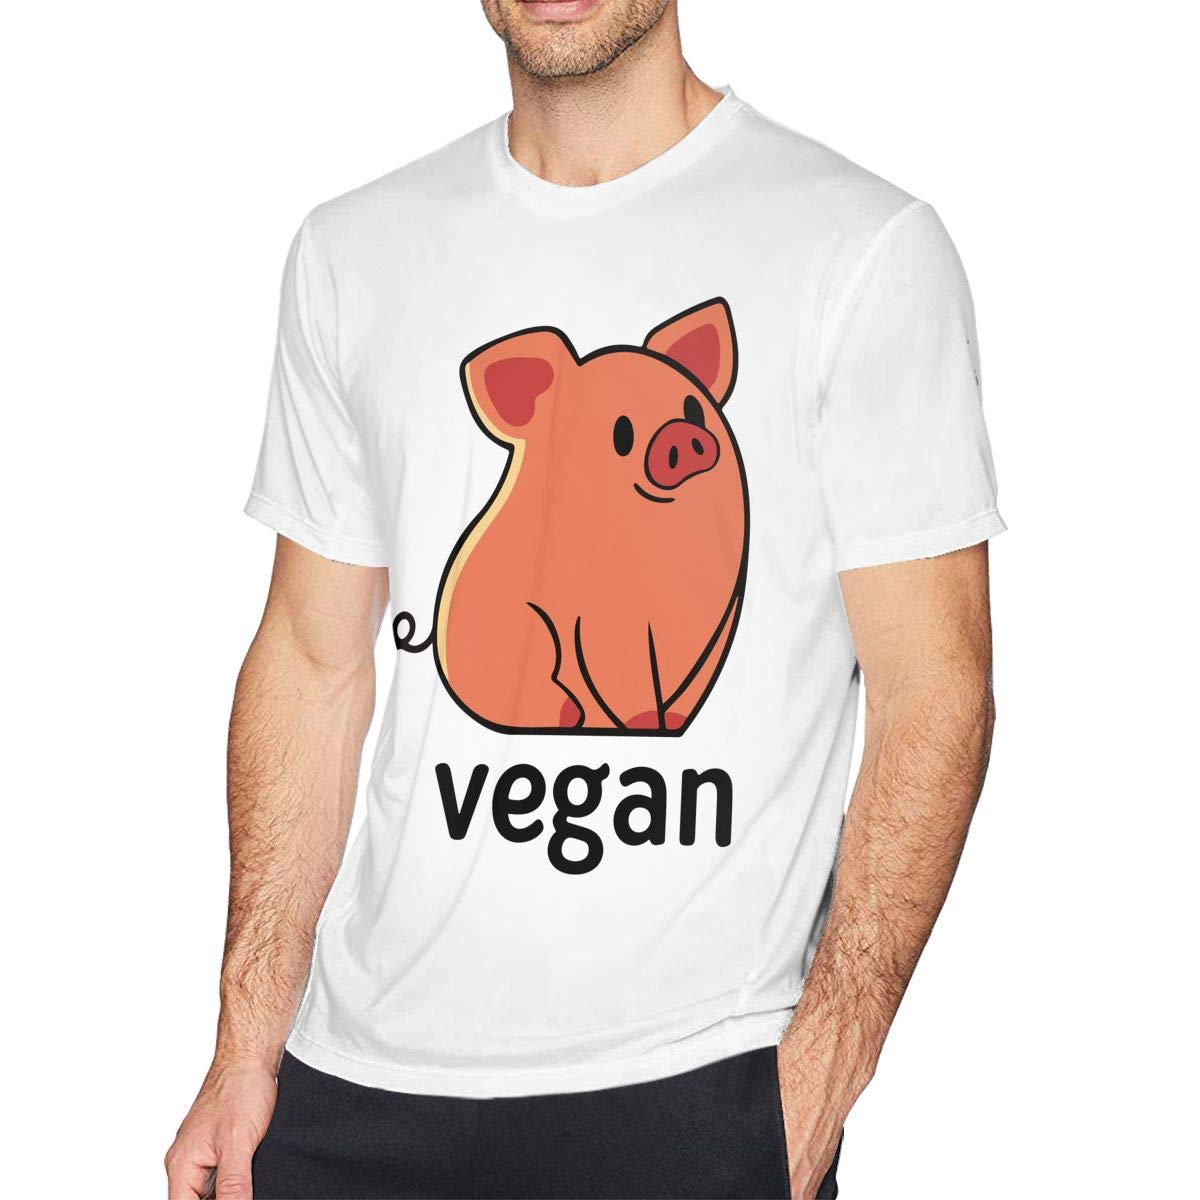 Mens Vegan Pig Short Sleeve T-Shirt Basal Shirt for Exercising